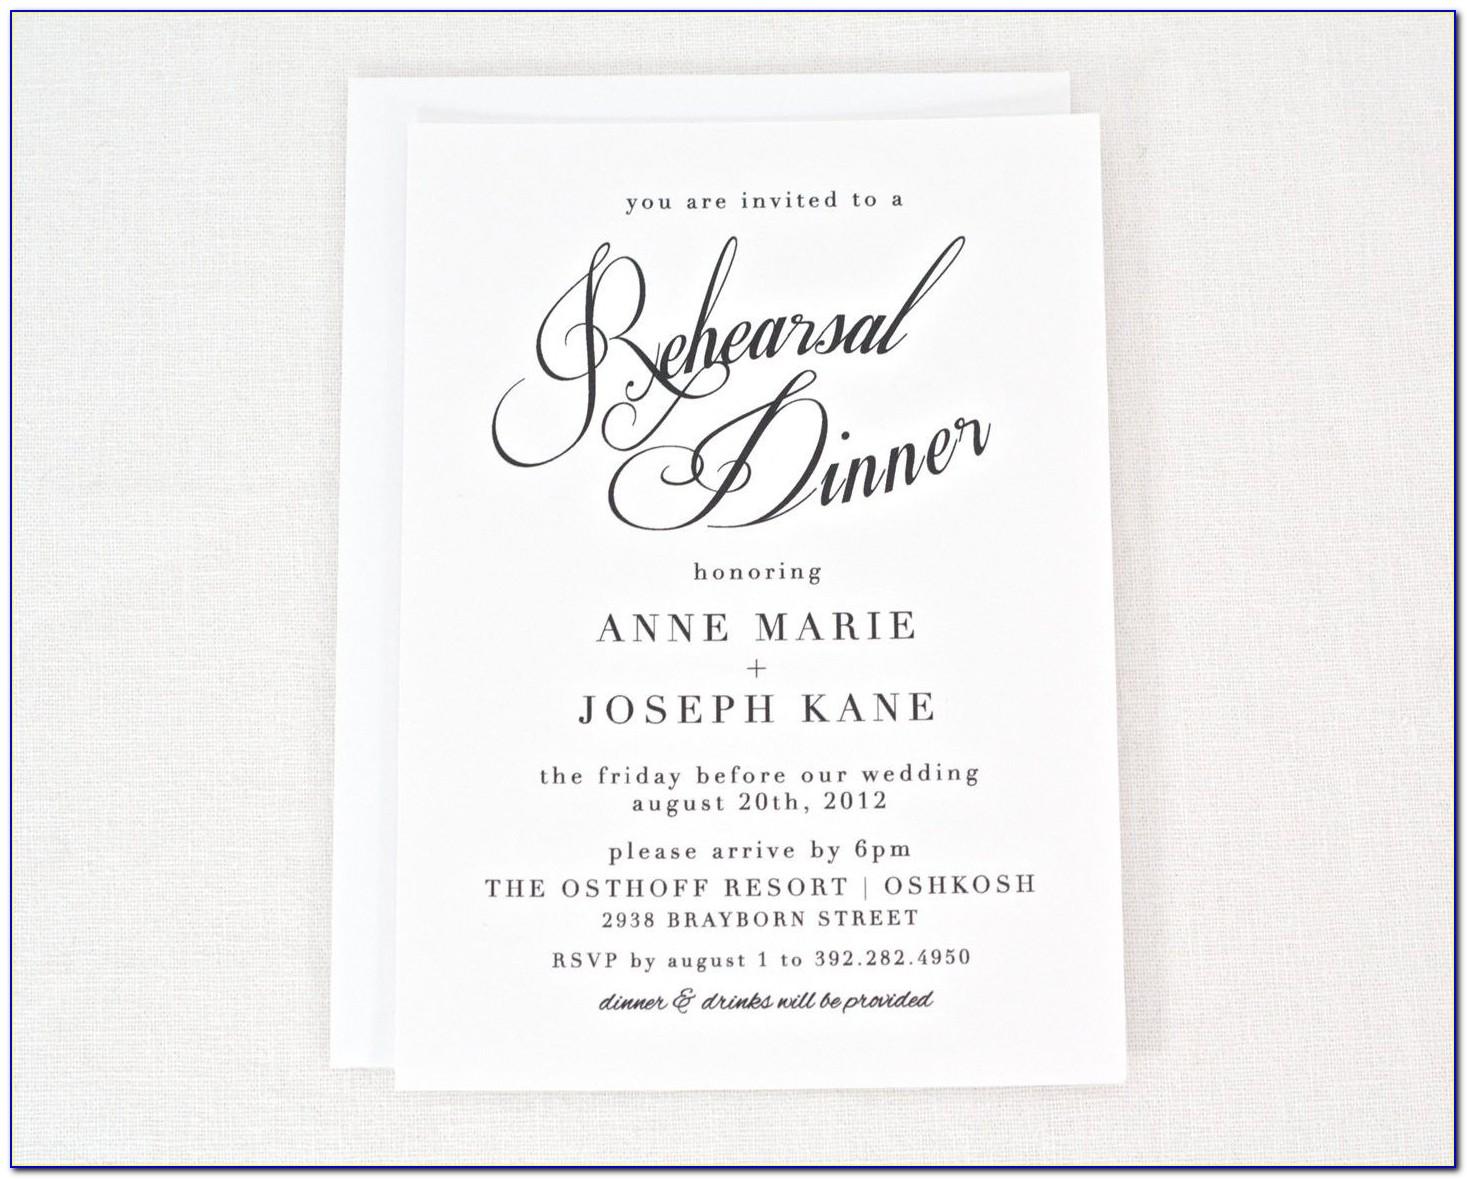 Rehearsal Dinner Invitation Wording Divorced Parents